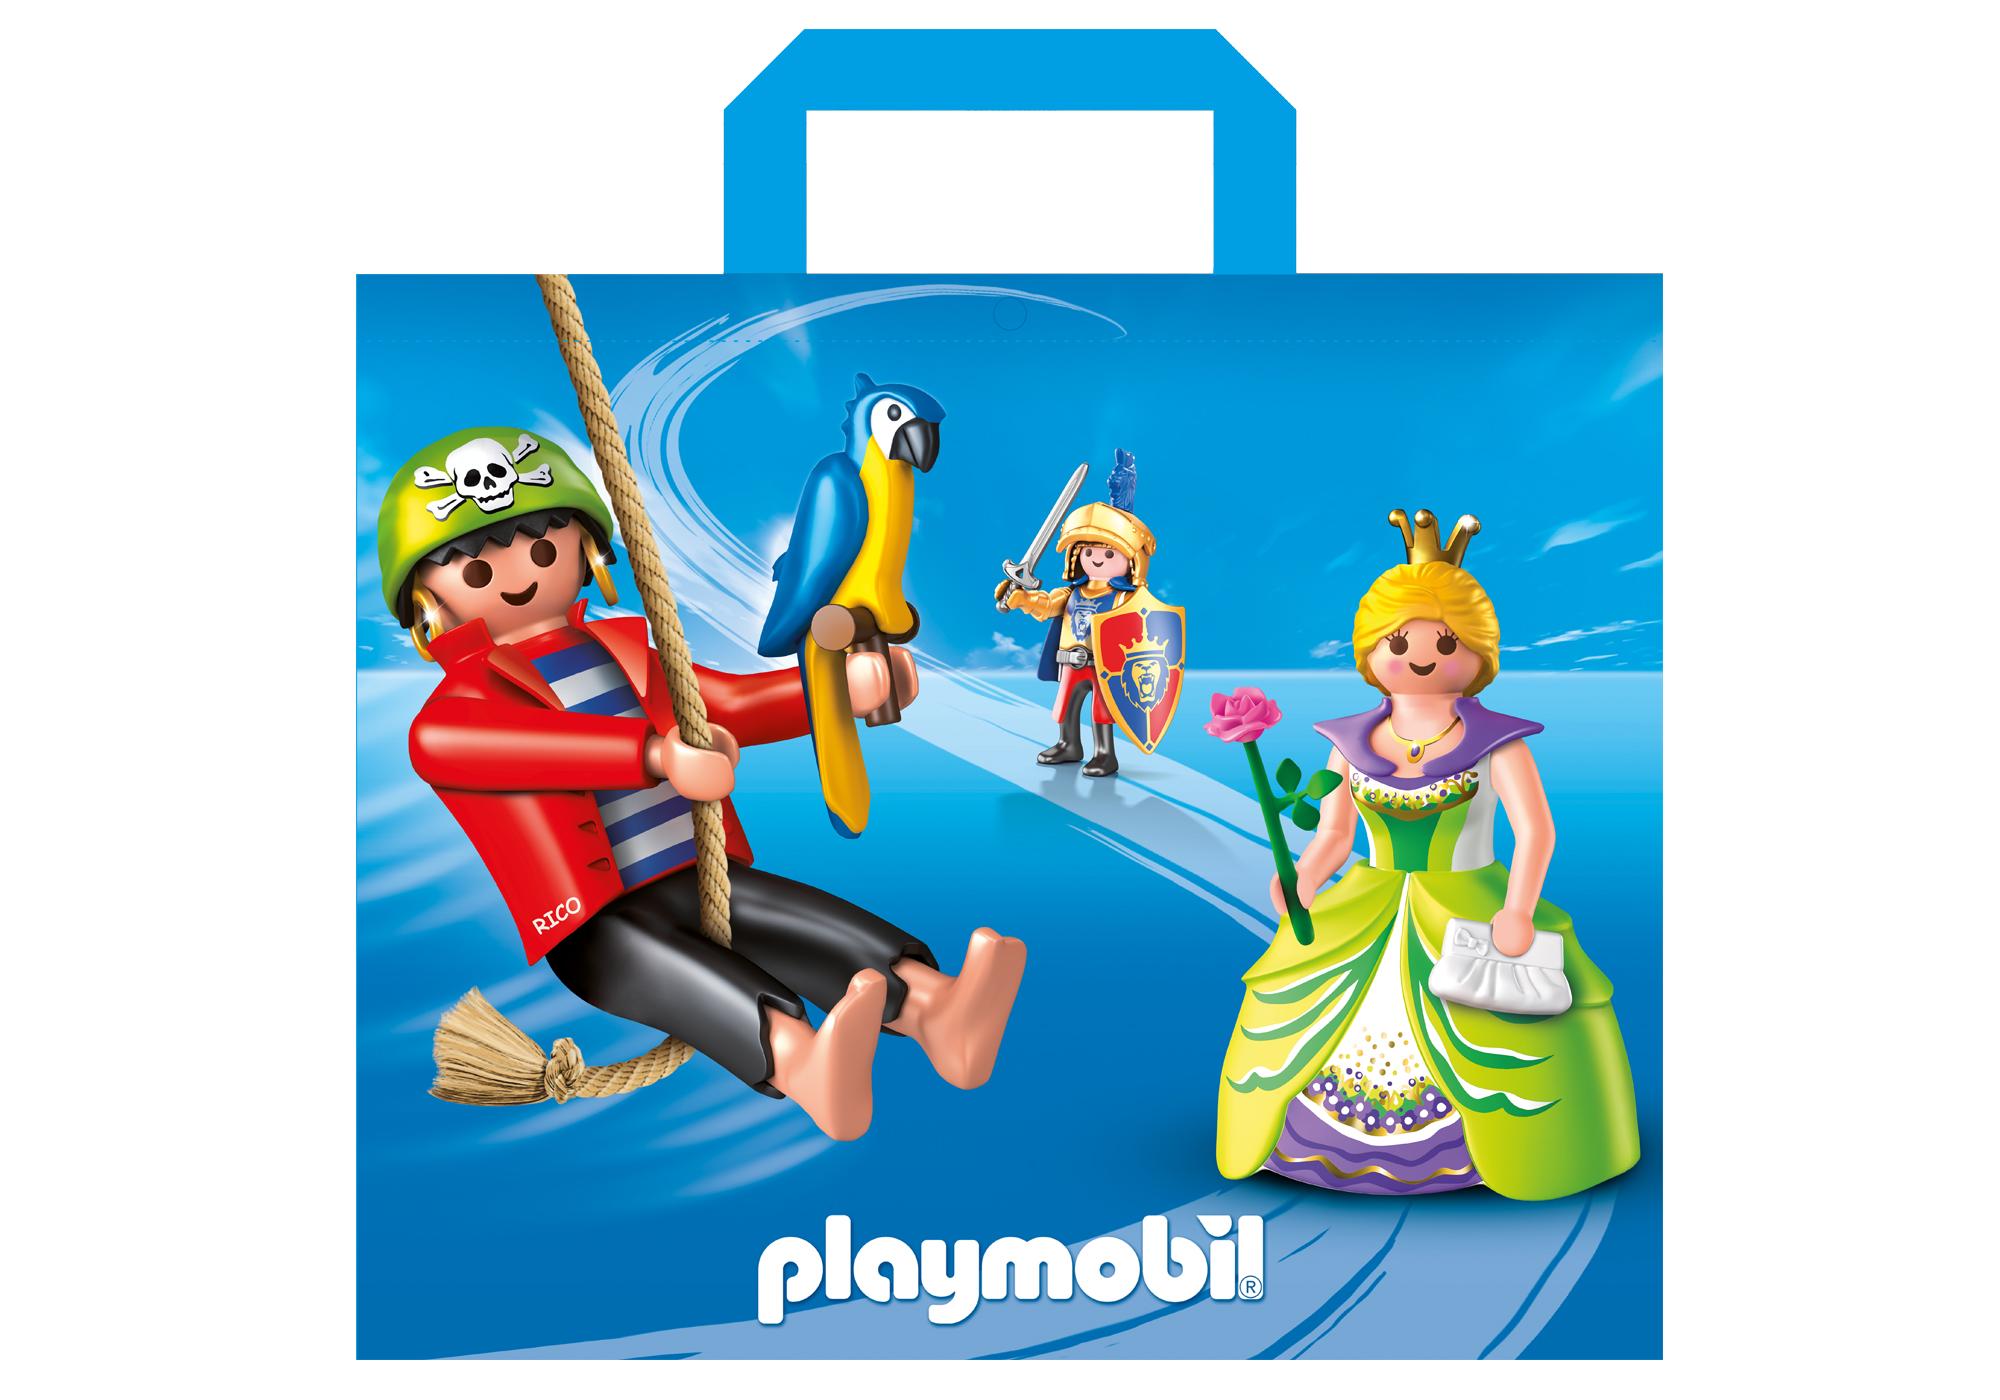 http://media.playmobil.com/i/playmobil/86483_product_detail/Reusable Shopping Bag XXL